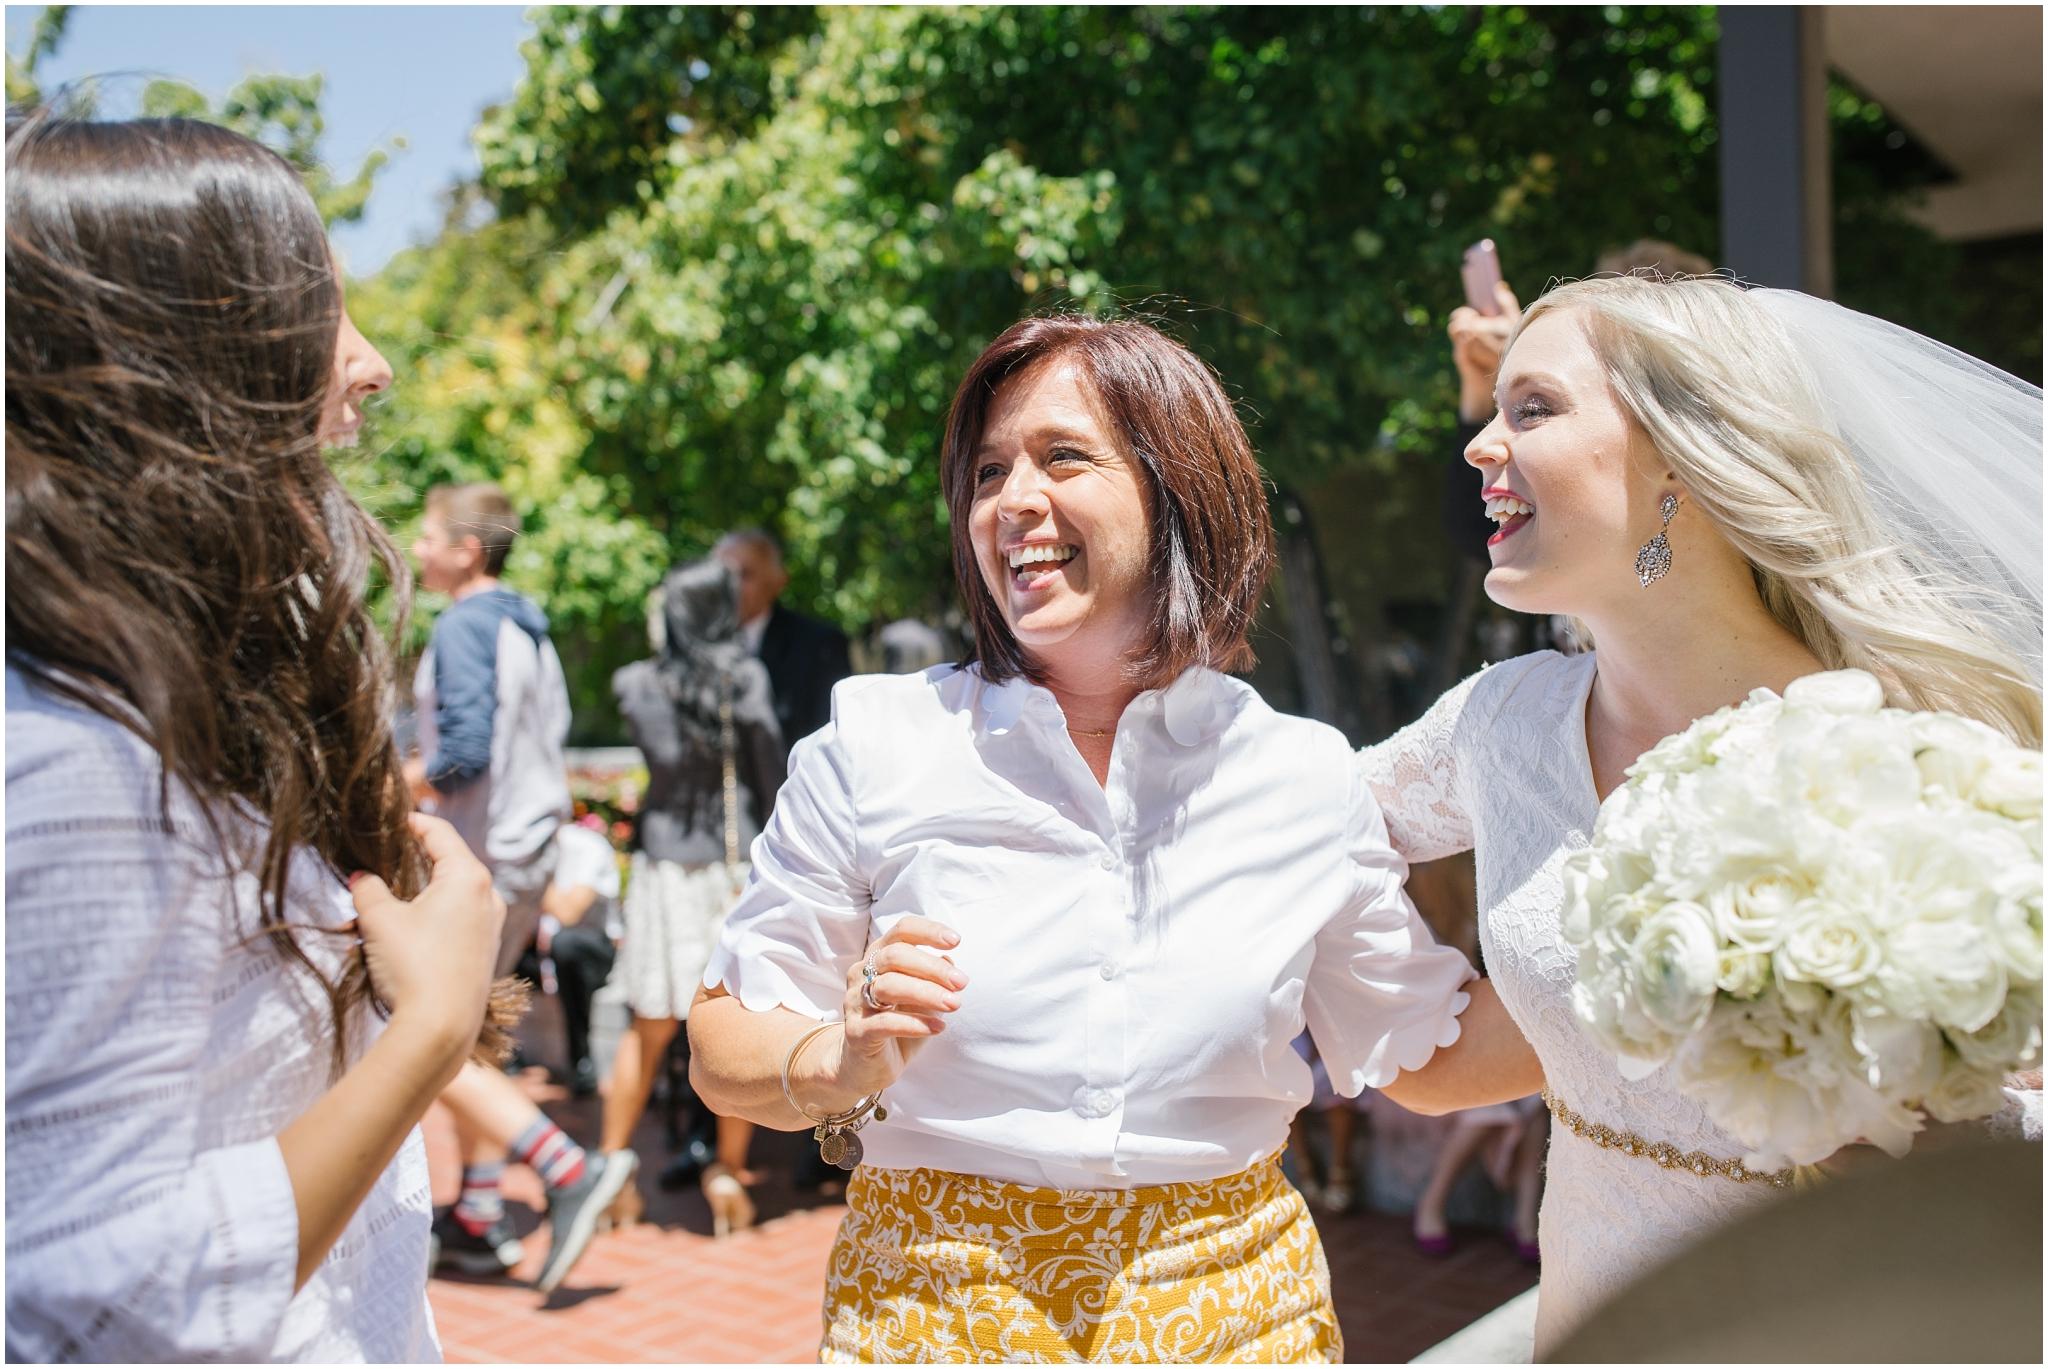 CherylandTyler-11_Lizzie-B-Imagery-Utah-Wedding-Photographer-Salt-Lake-City-Temple-Wells-Fargo-Building-Reception.jpg